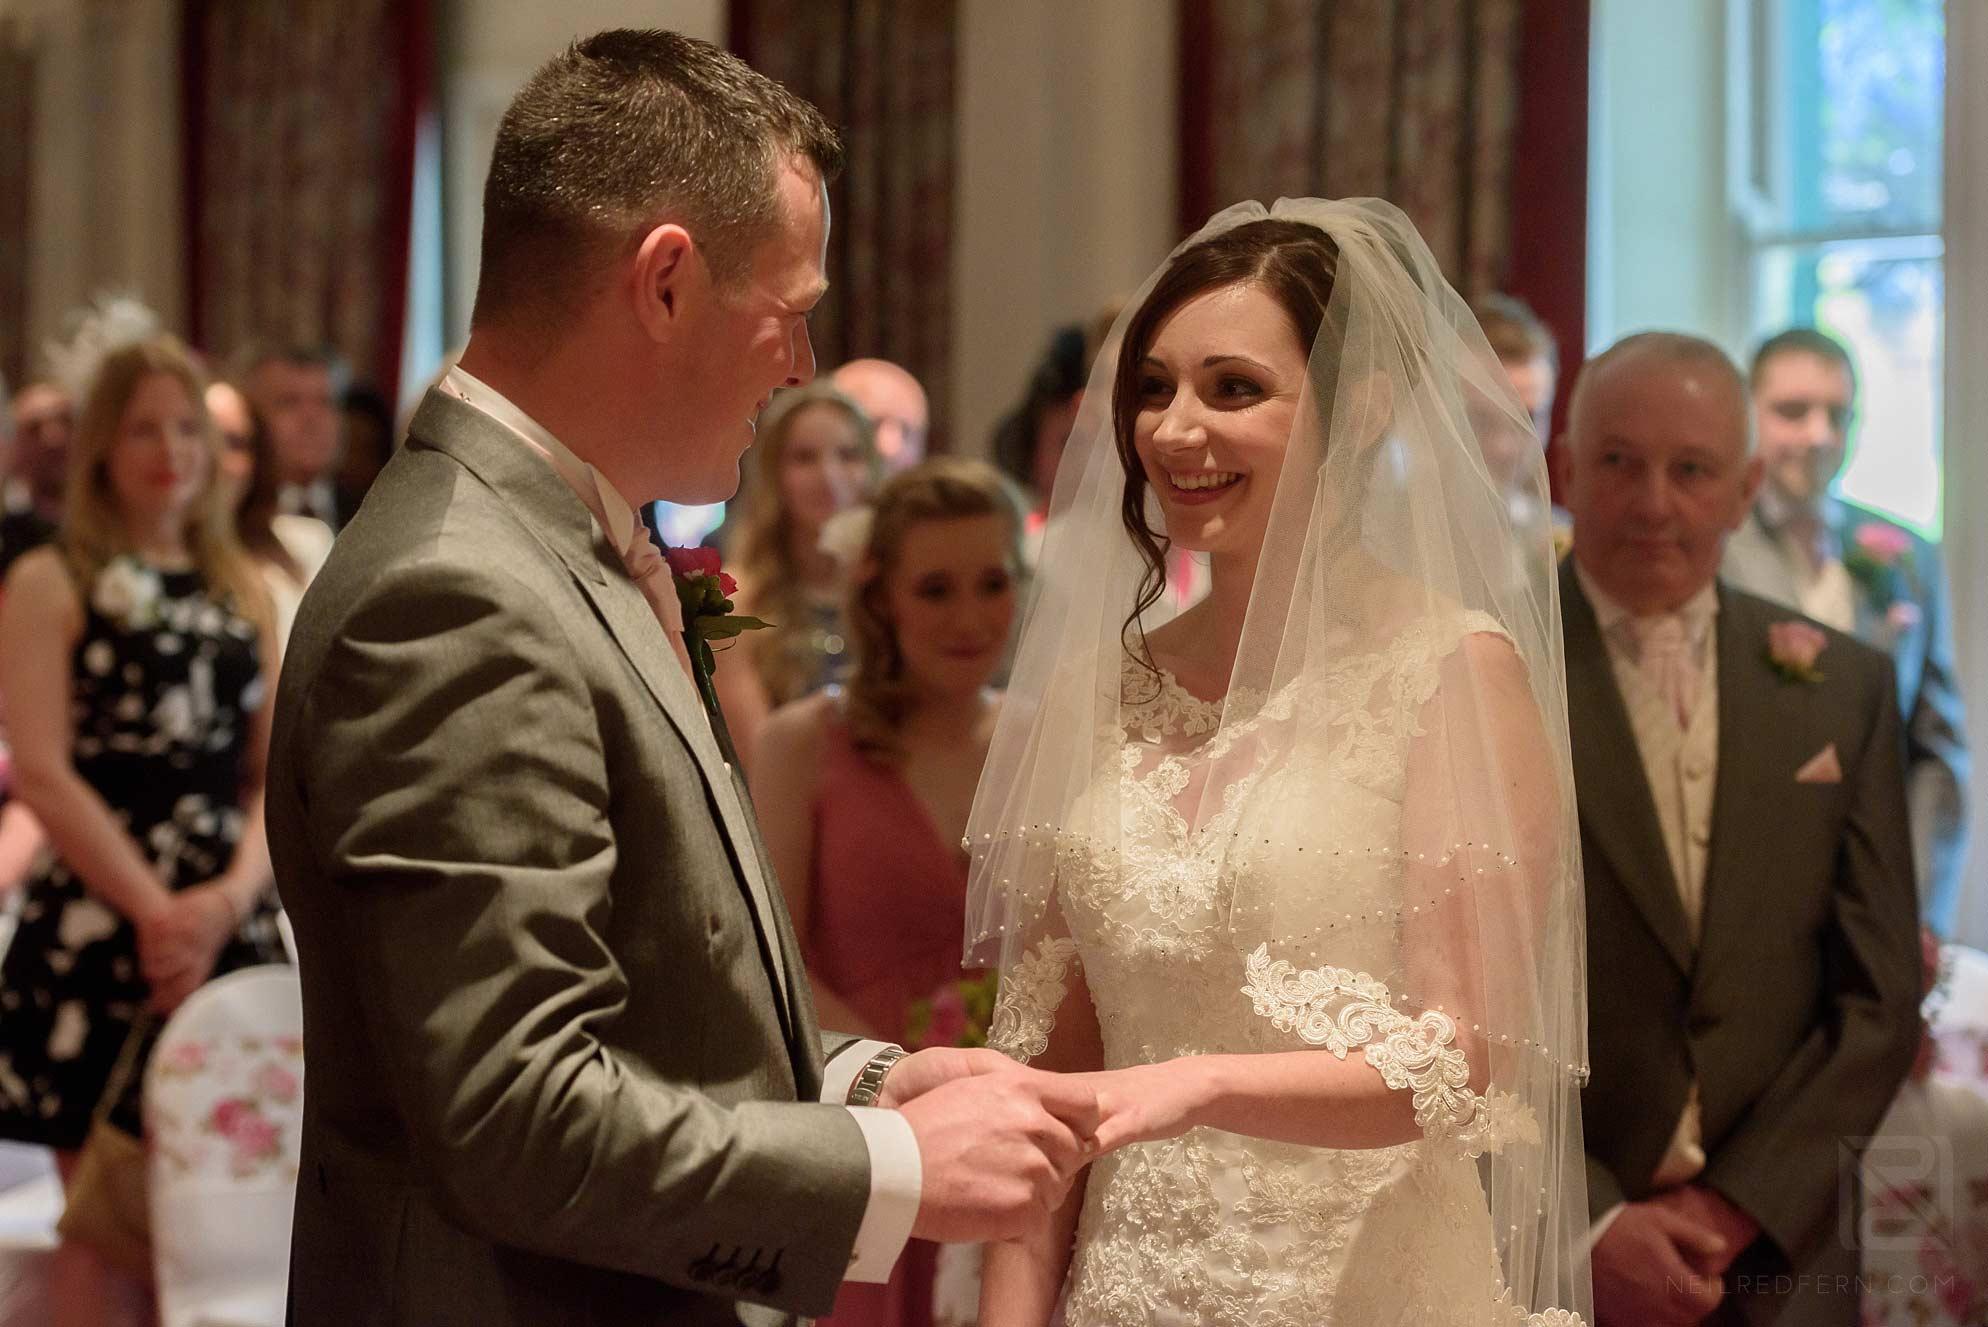 Metropole-Hotel-Llandrindod-Wells-wedding-19